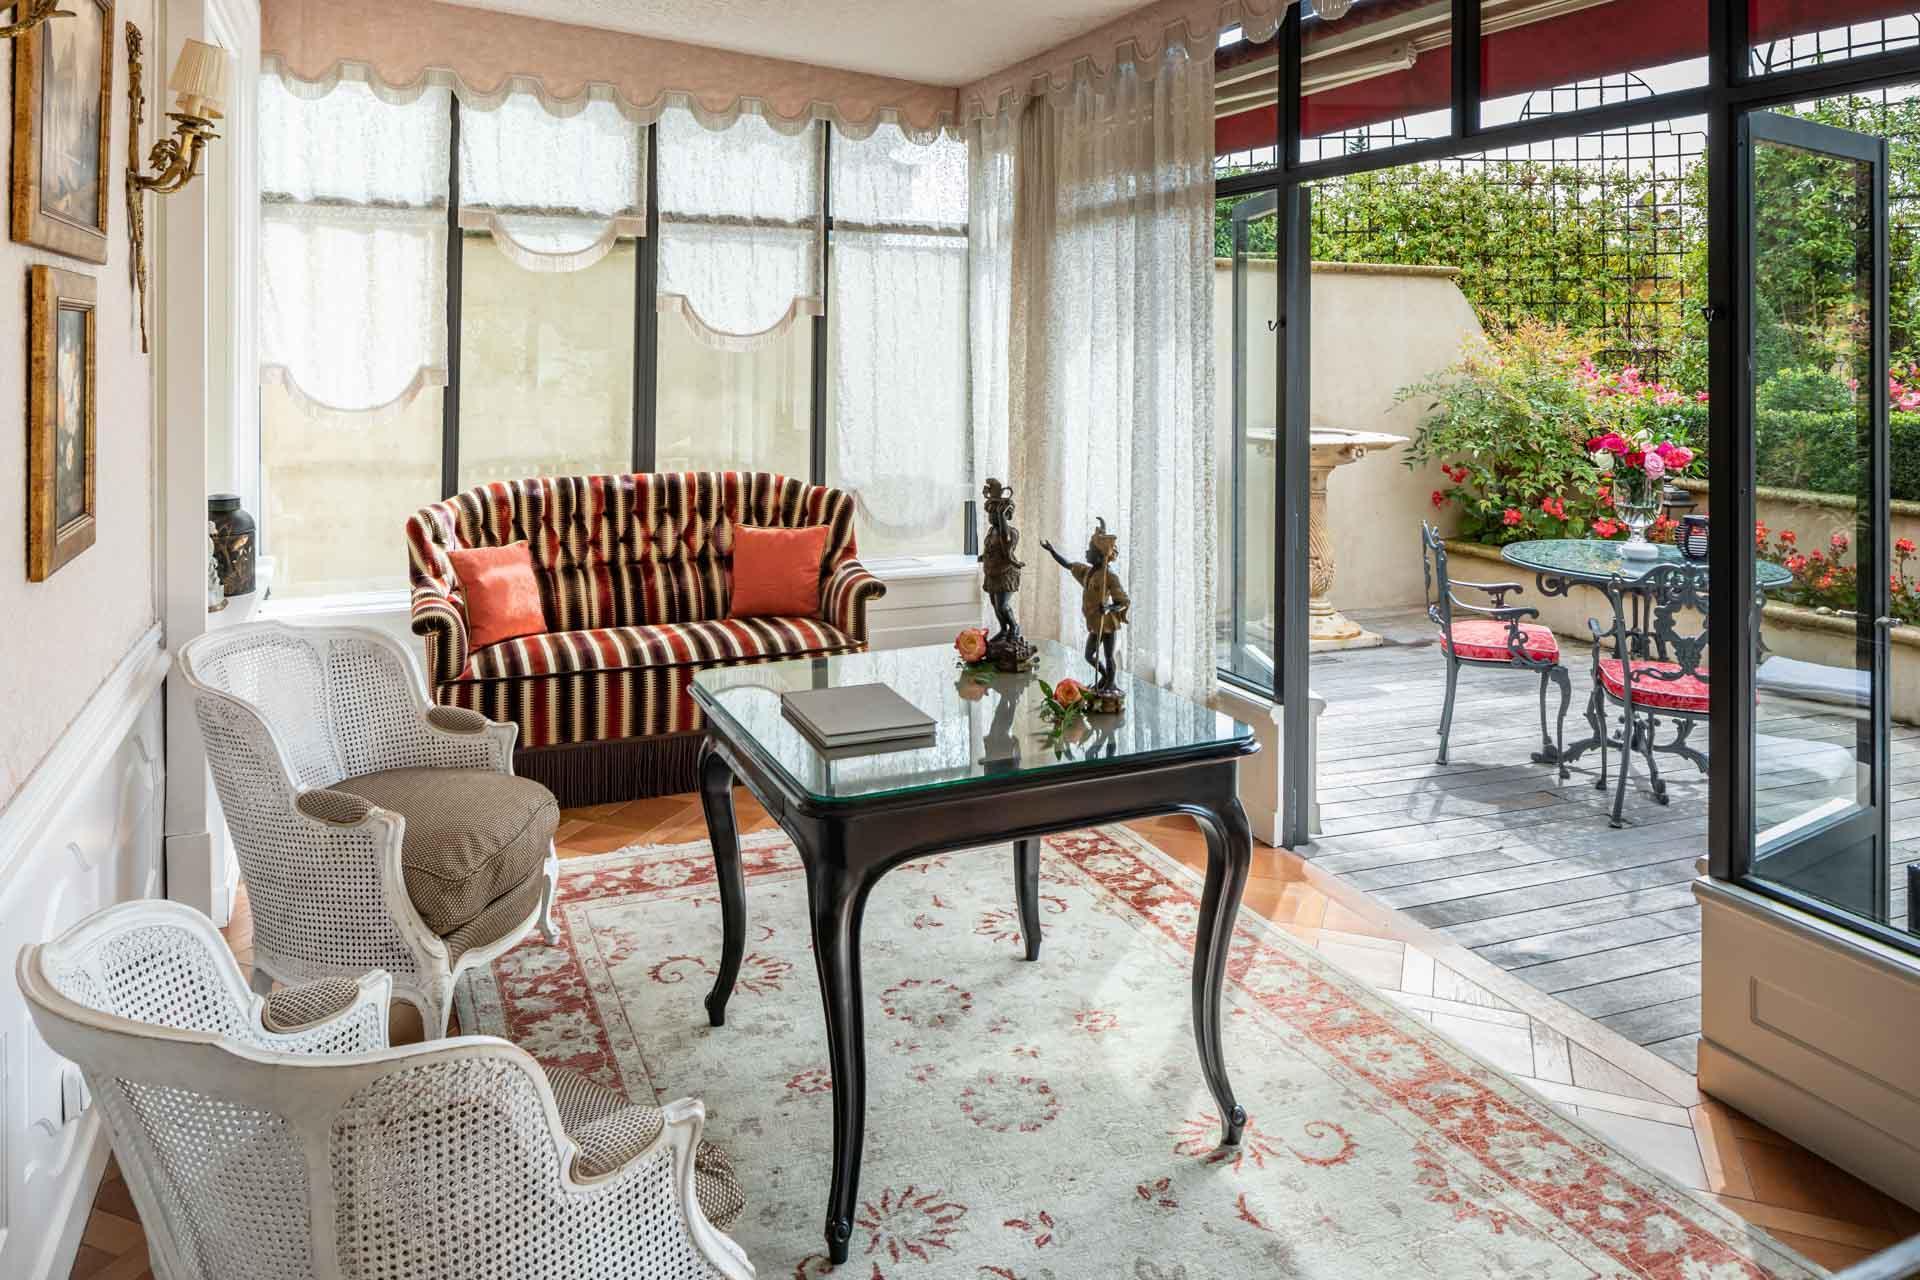 Villa Gallici © SAS Baglioni Hotels France